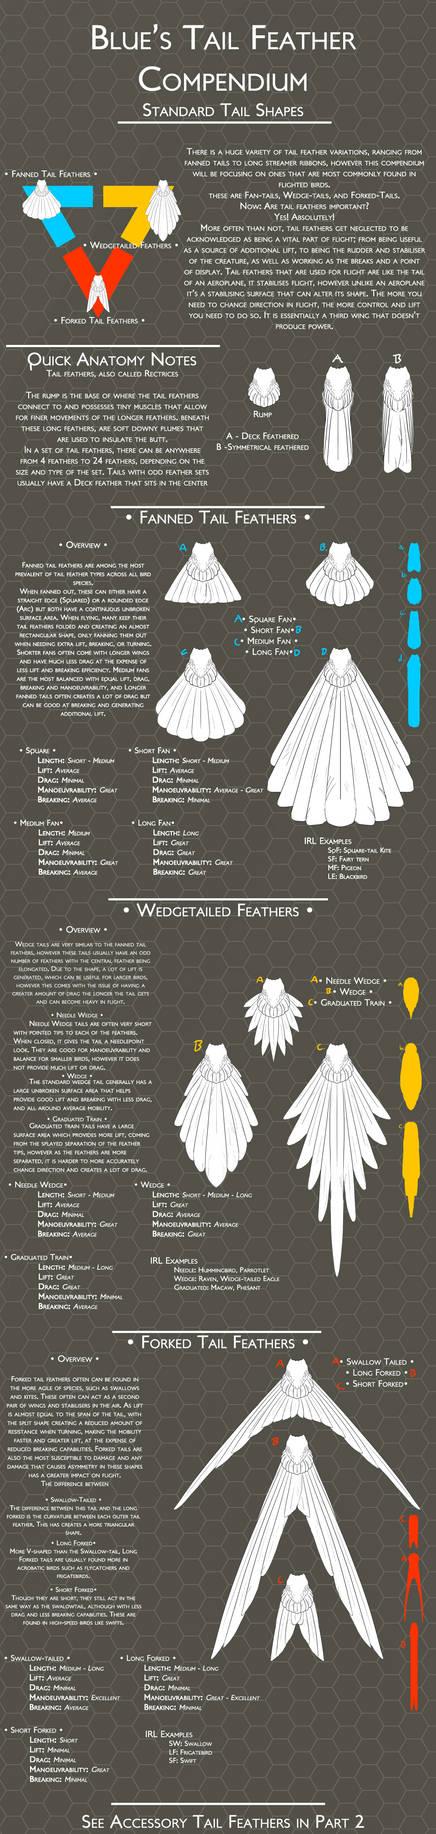 Tail Feather Compendium: Part 1